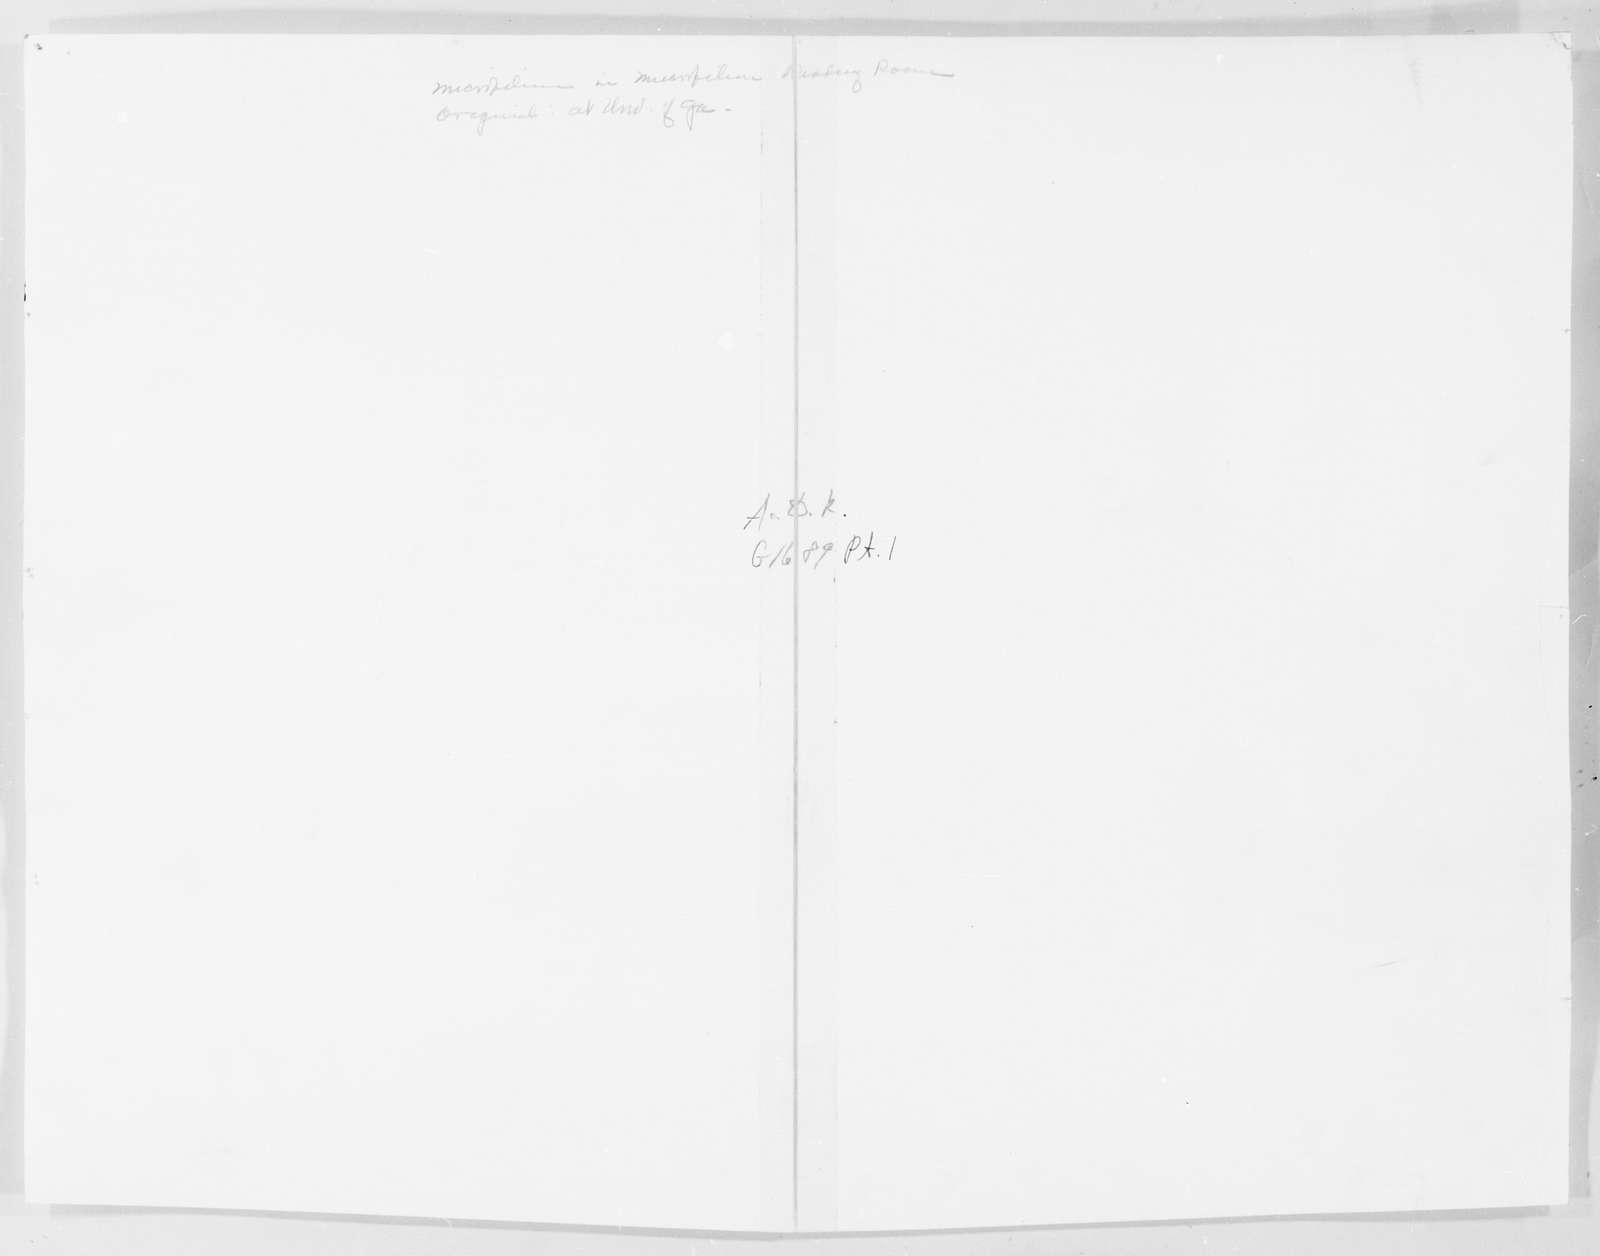 Confederate States of America records: Microfilm Reel 37